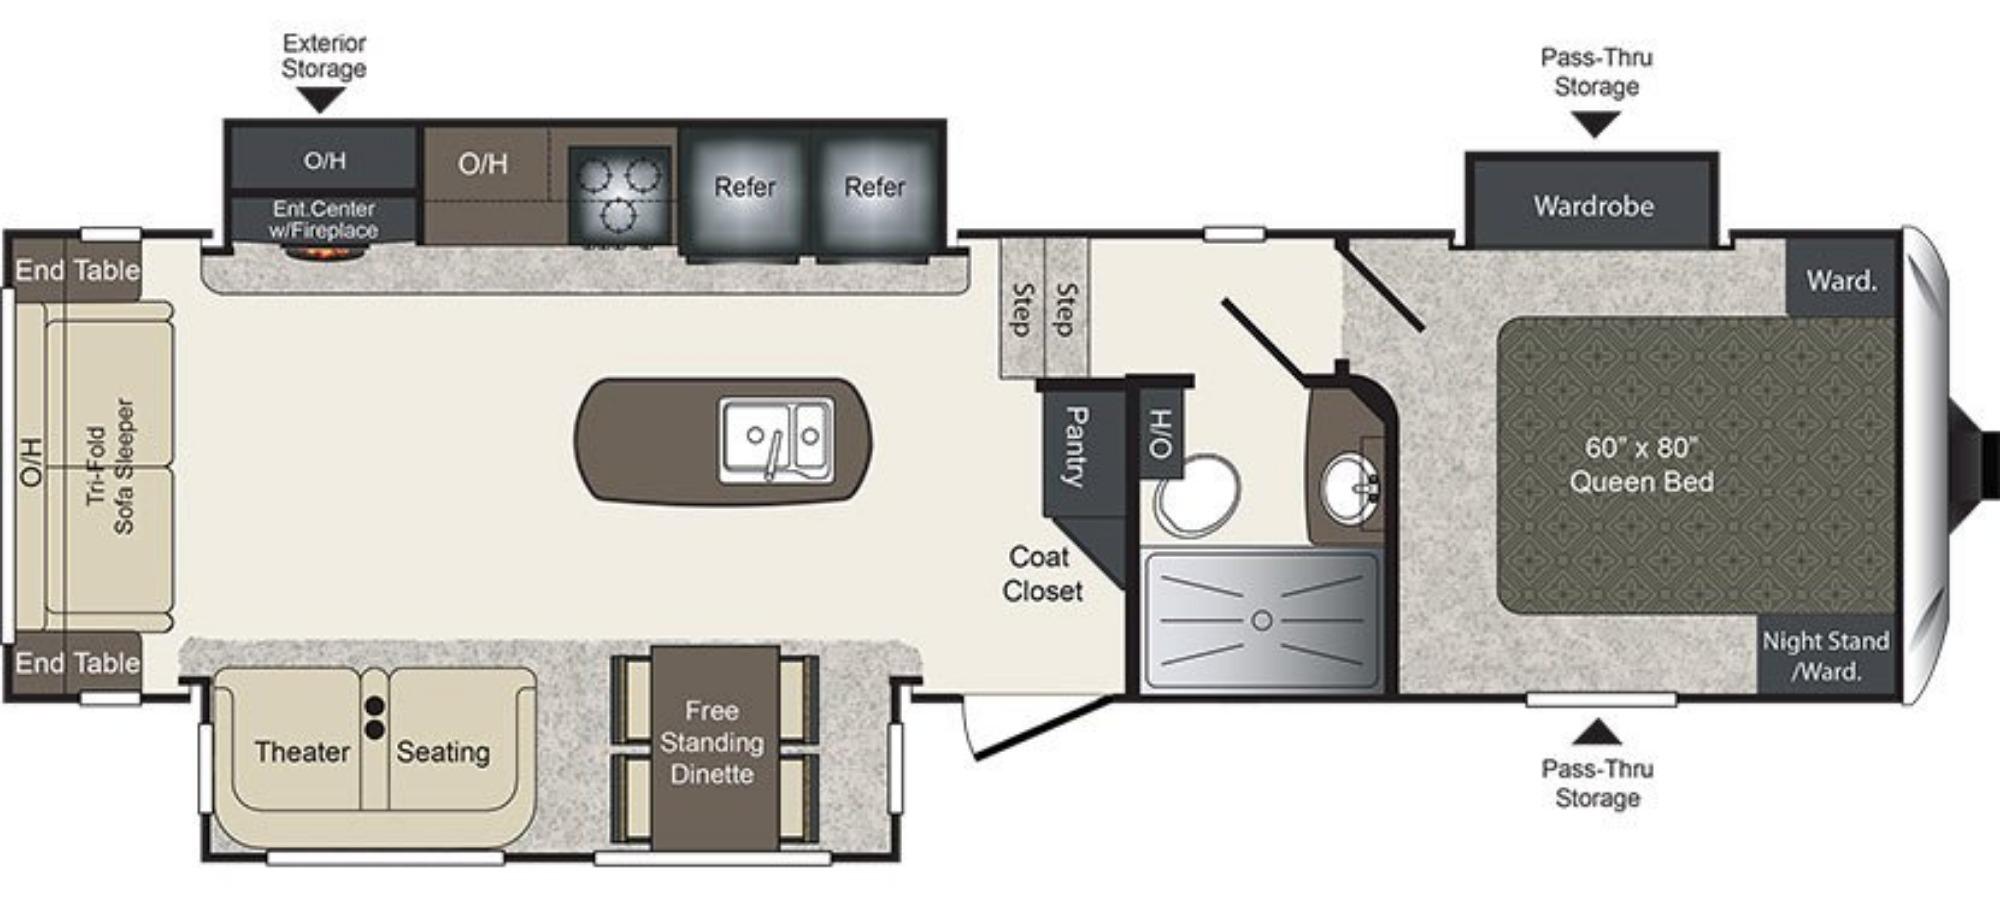 View Floor Plan for 2018 KEYSTONE LAREDO 290SRL